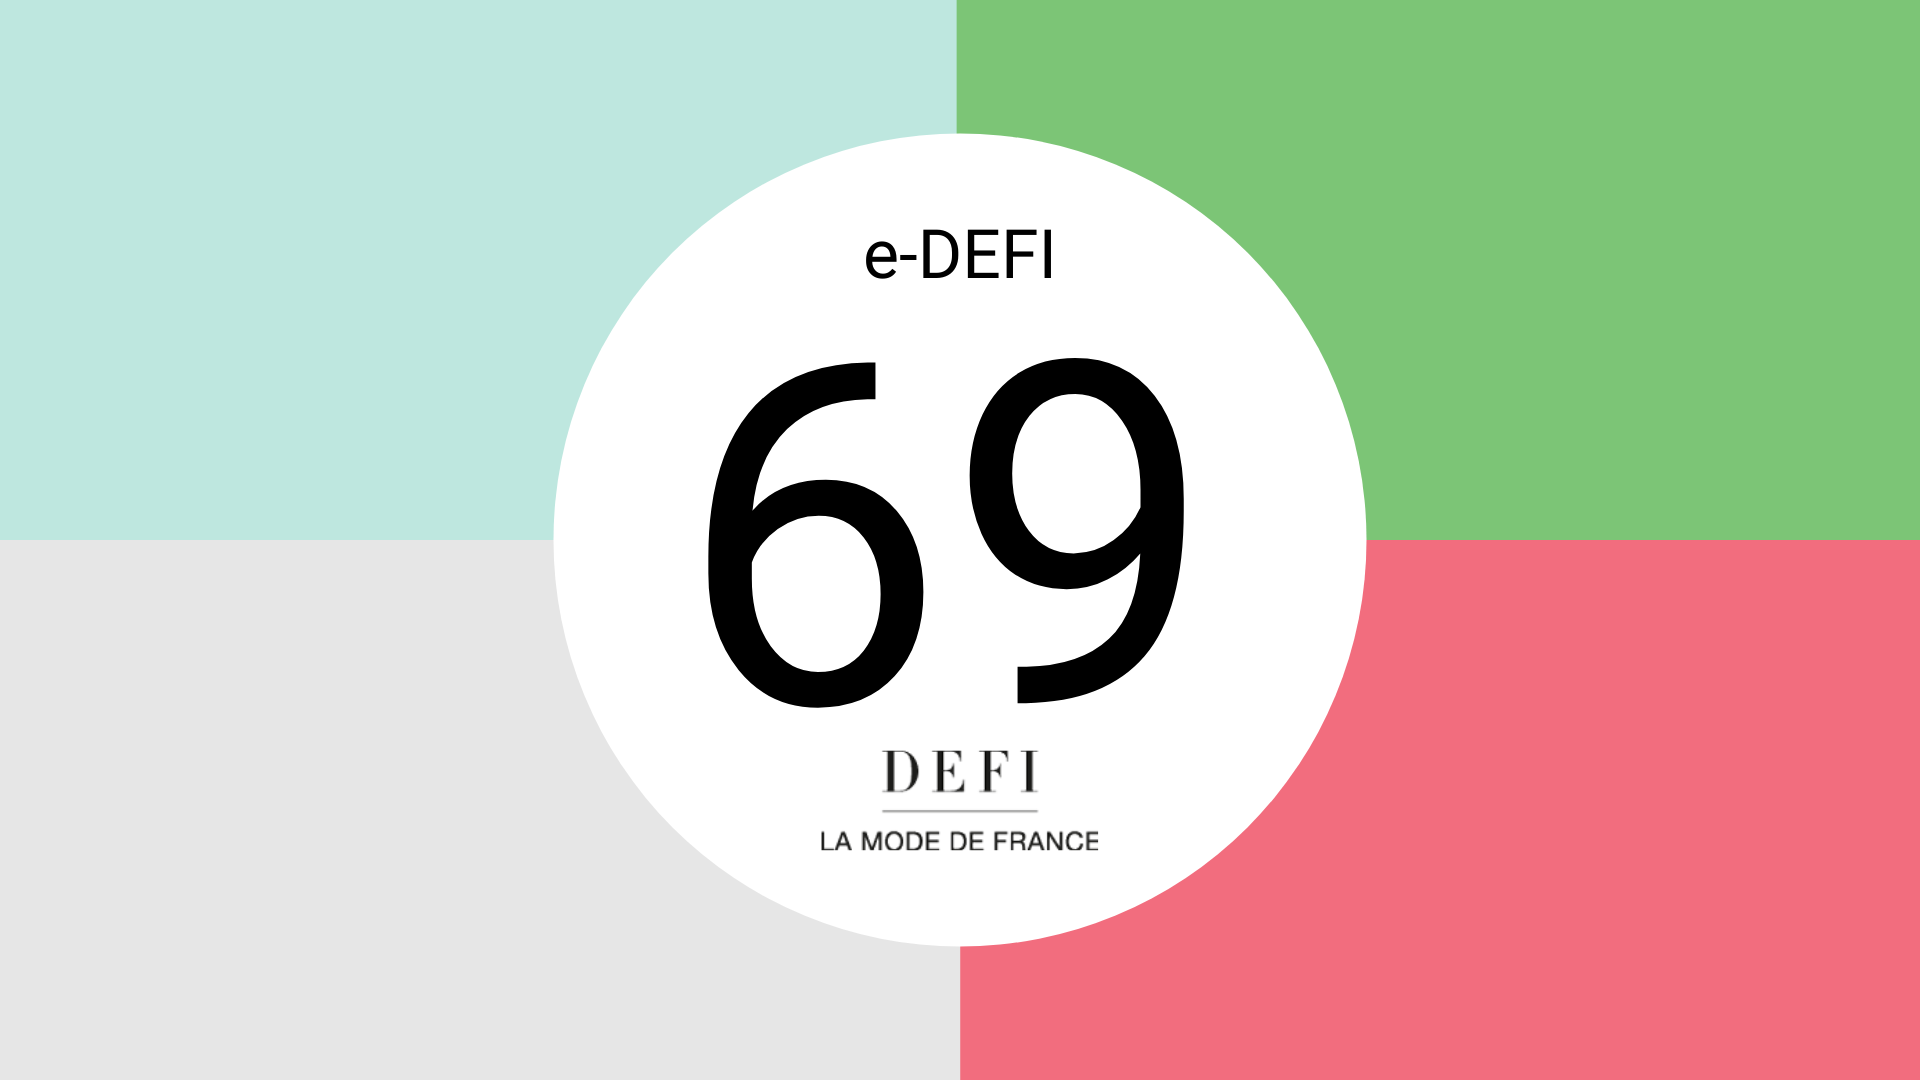 Bulletin e-DEFI #69